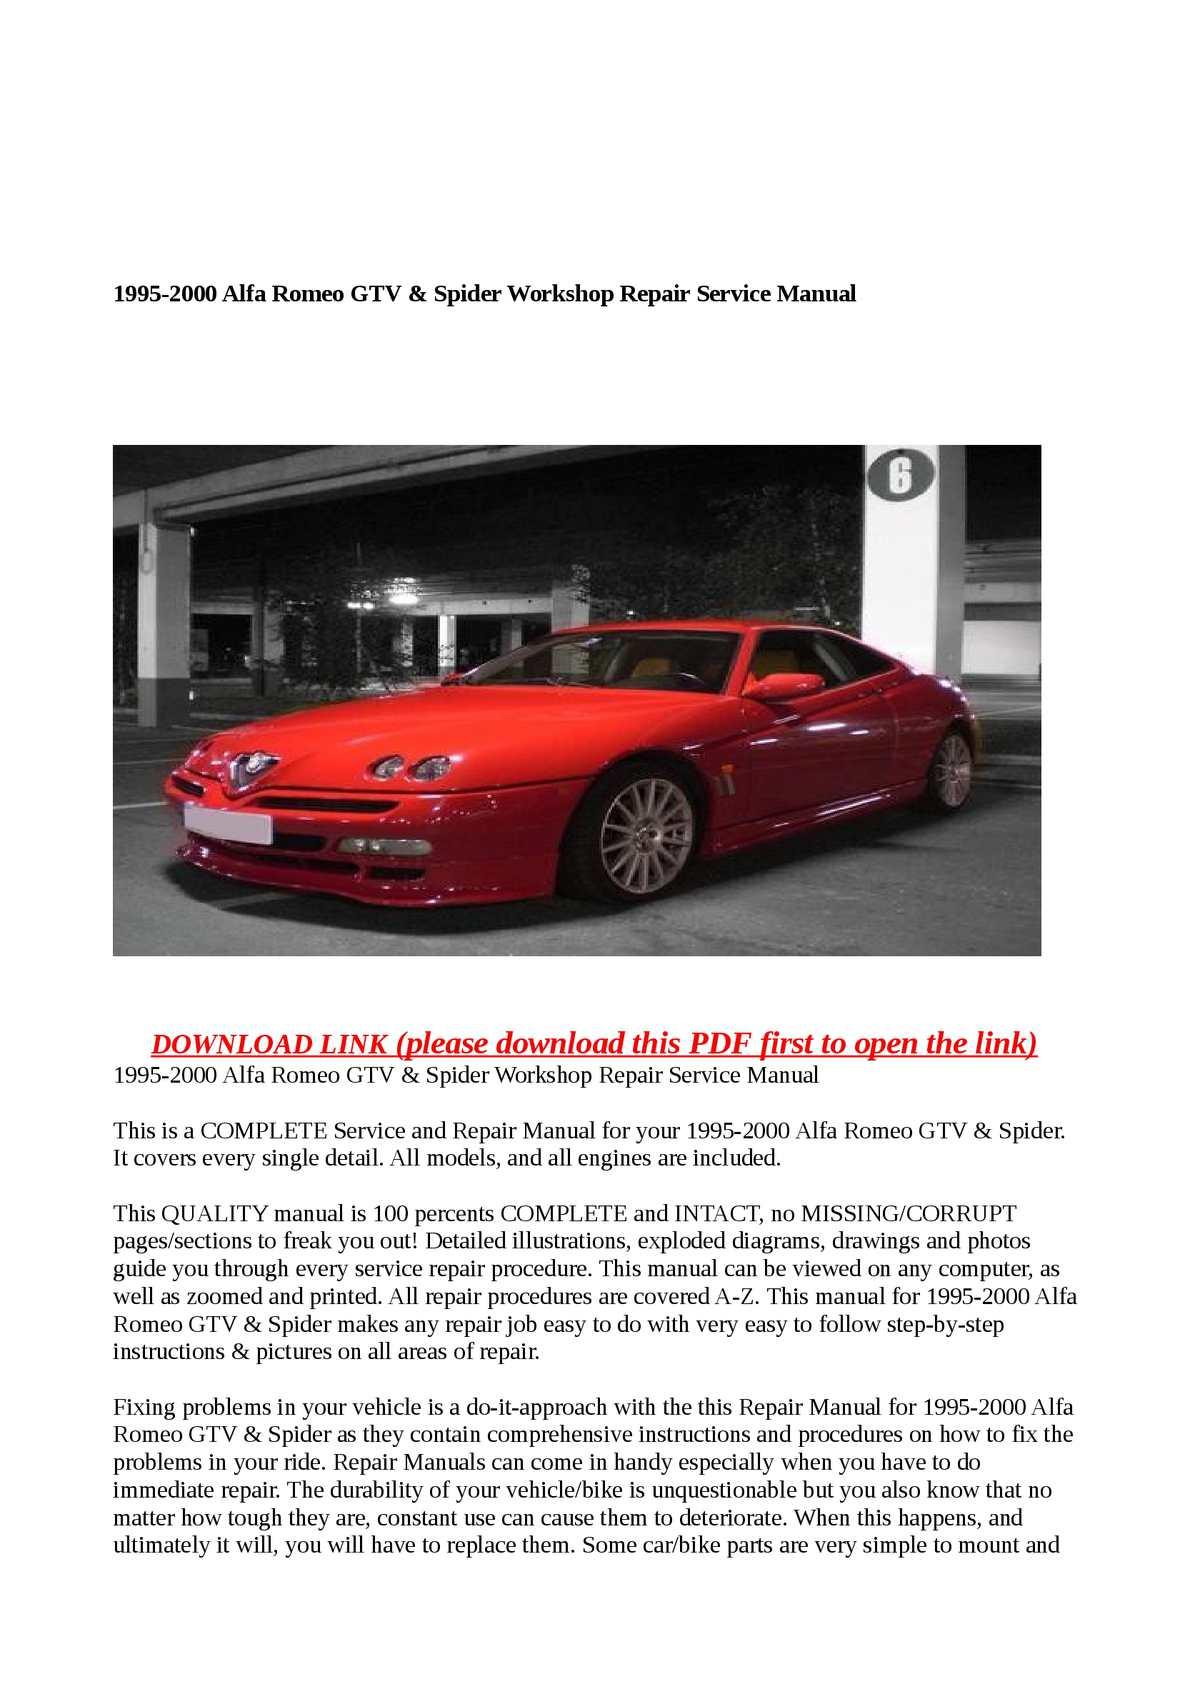 Calaméo - 1995-2000 Alfa Romeo GTV & Spider Workshop Repair Service Manual